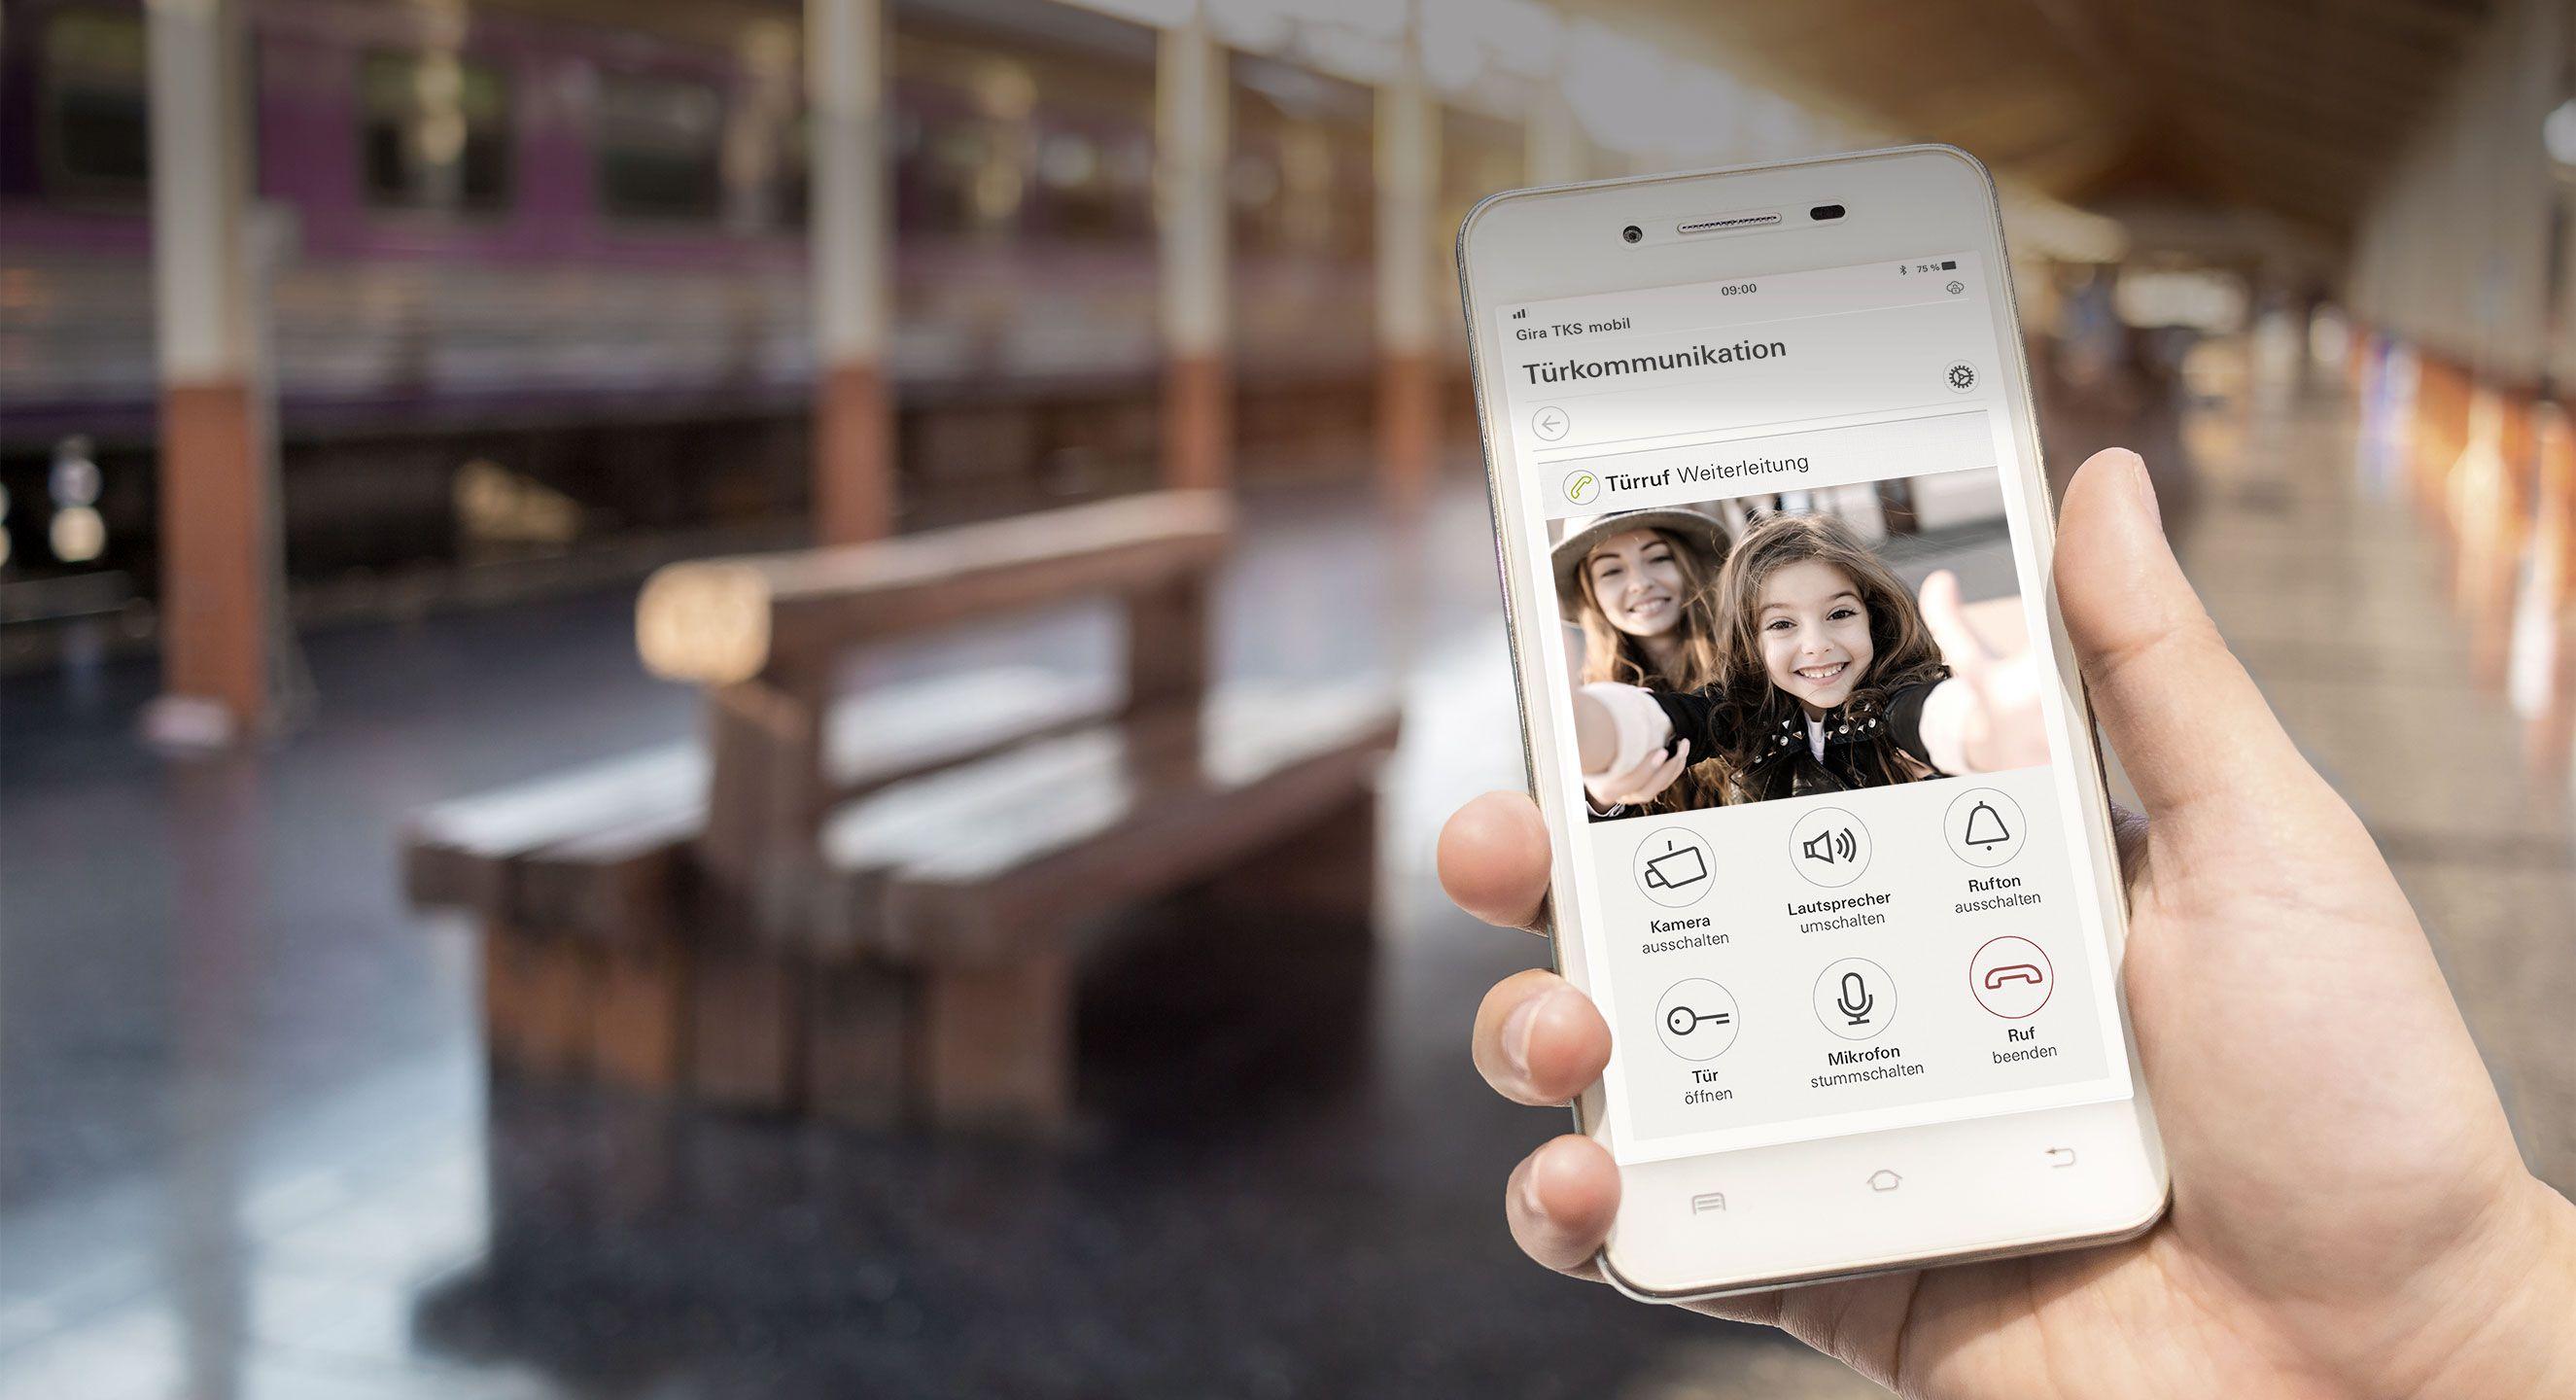 TKS mobil auf Handy